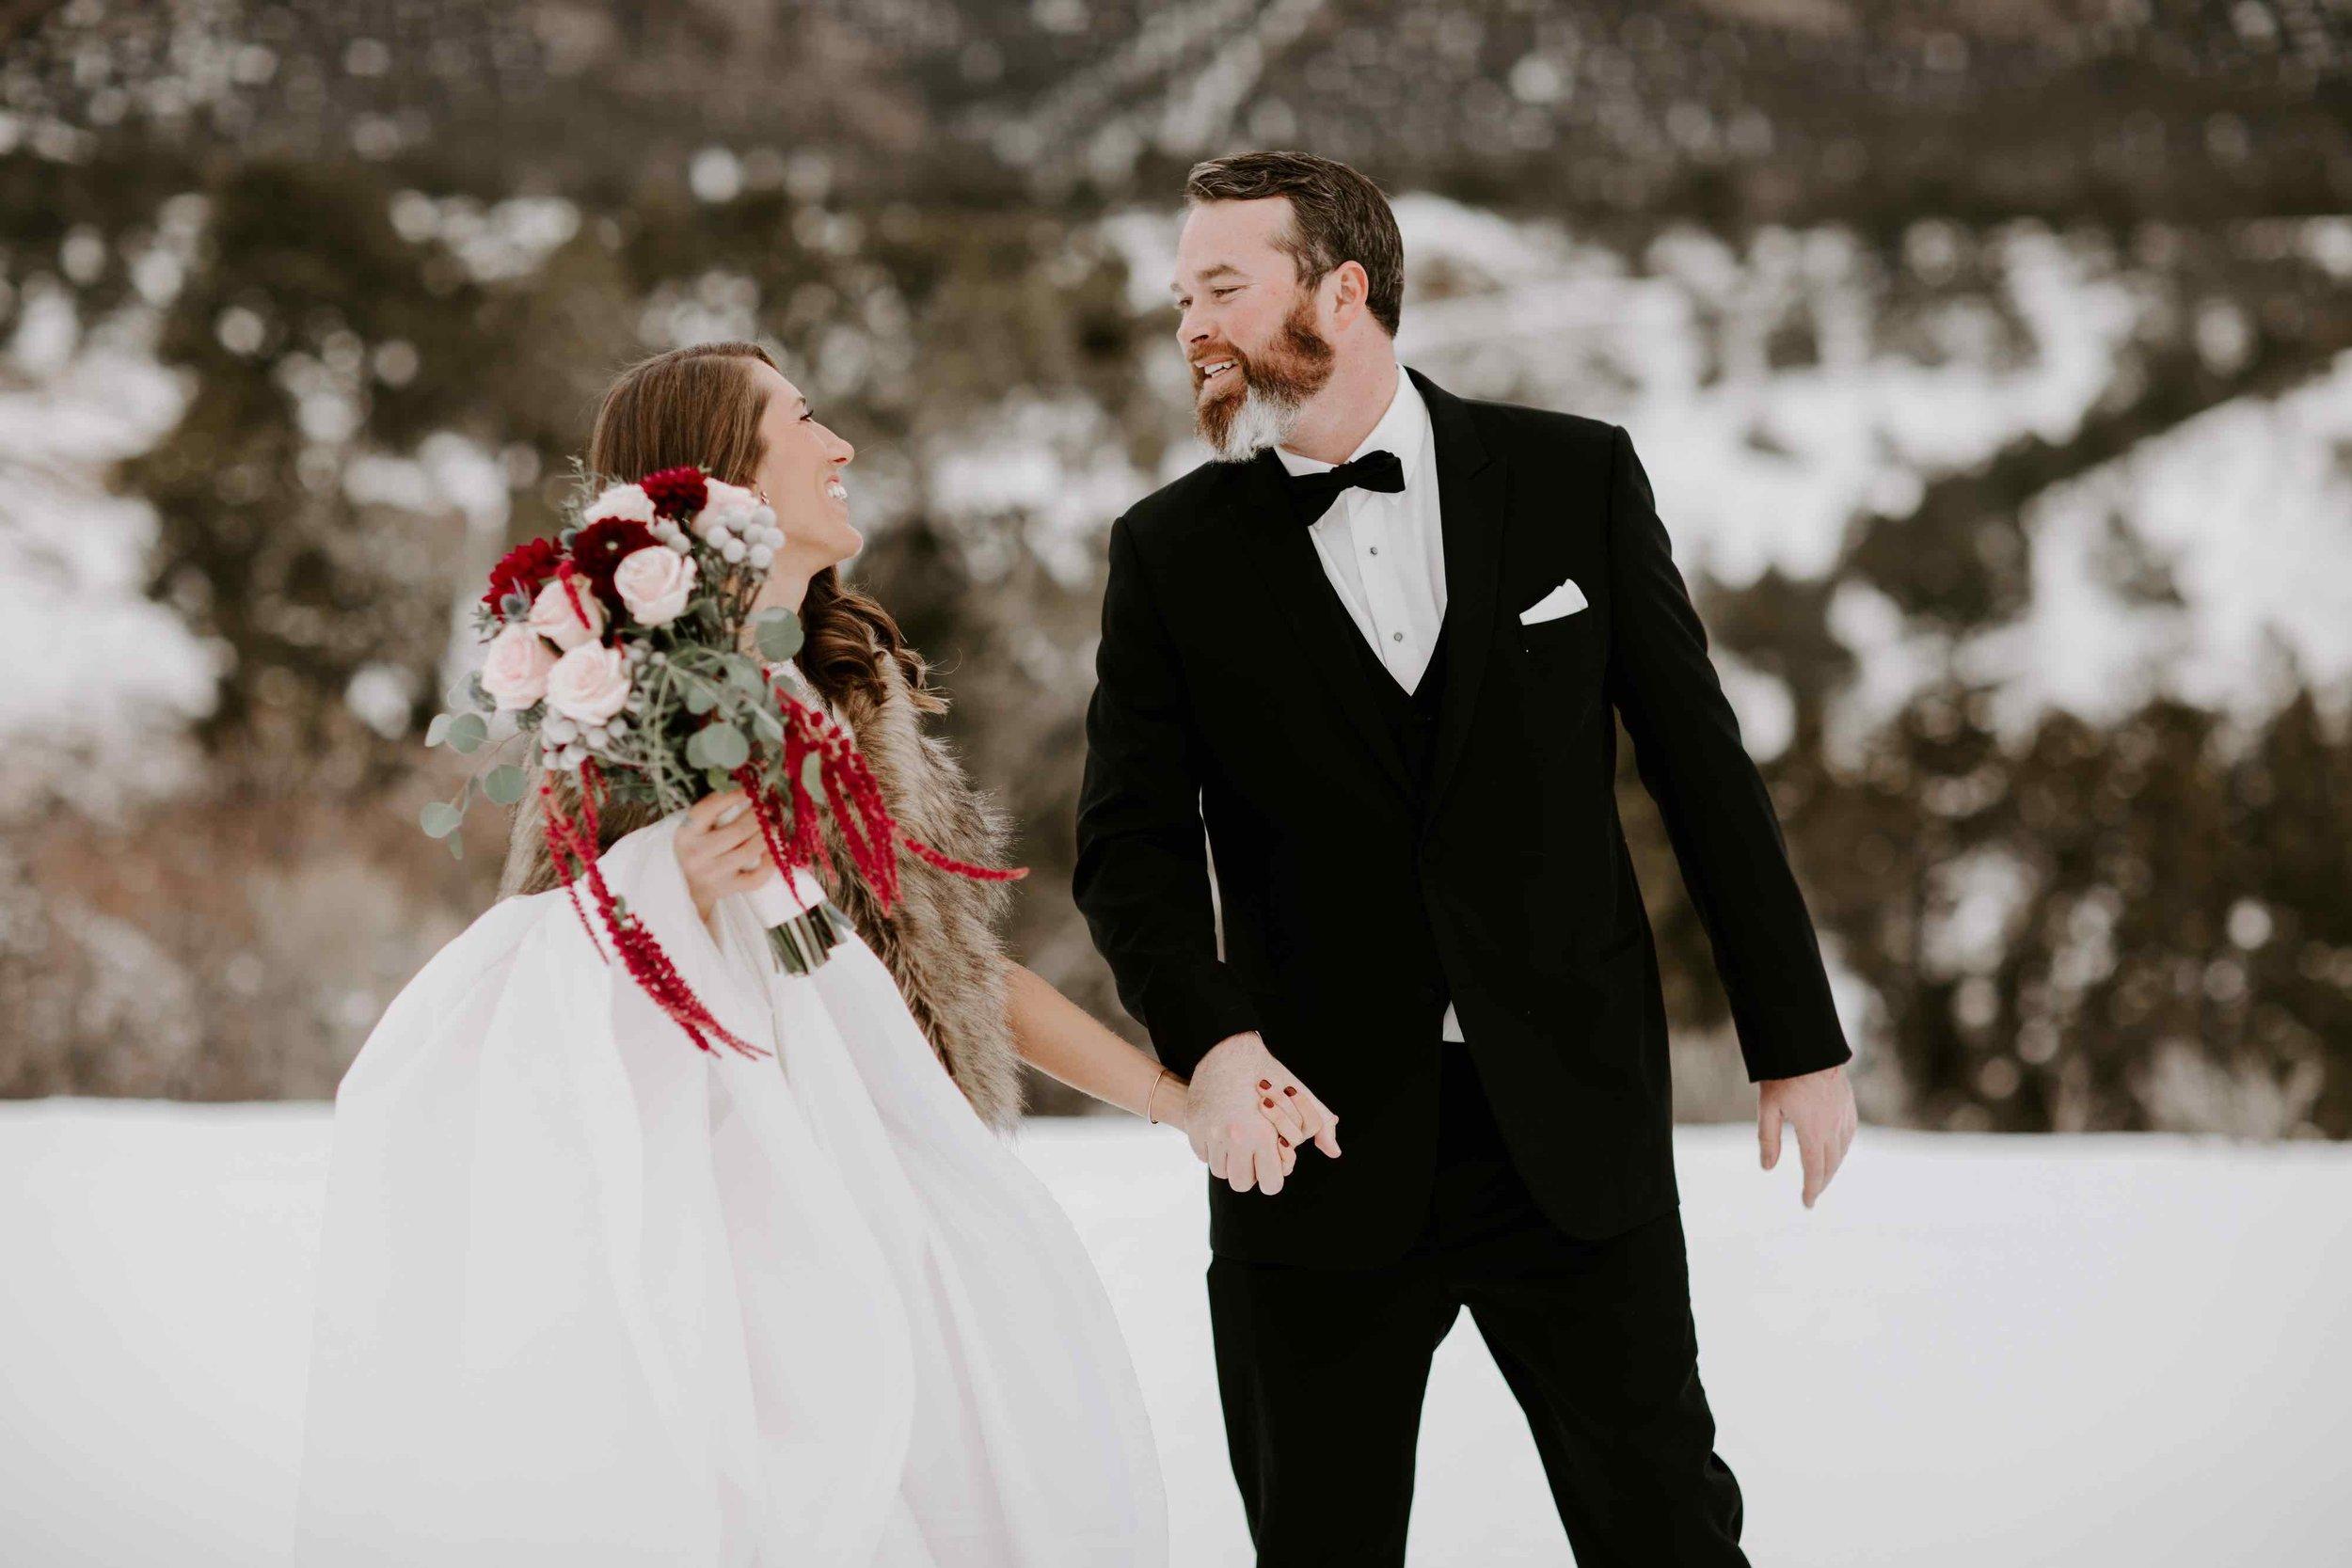 Kisa Conrad Favorites-0035-colorado-wedding-photographer-denver-springs-vailhotel-glenwood-springs-colorado-wedding-photographer.jpeg